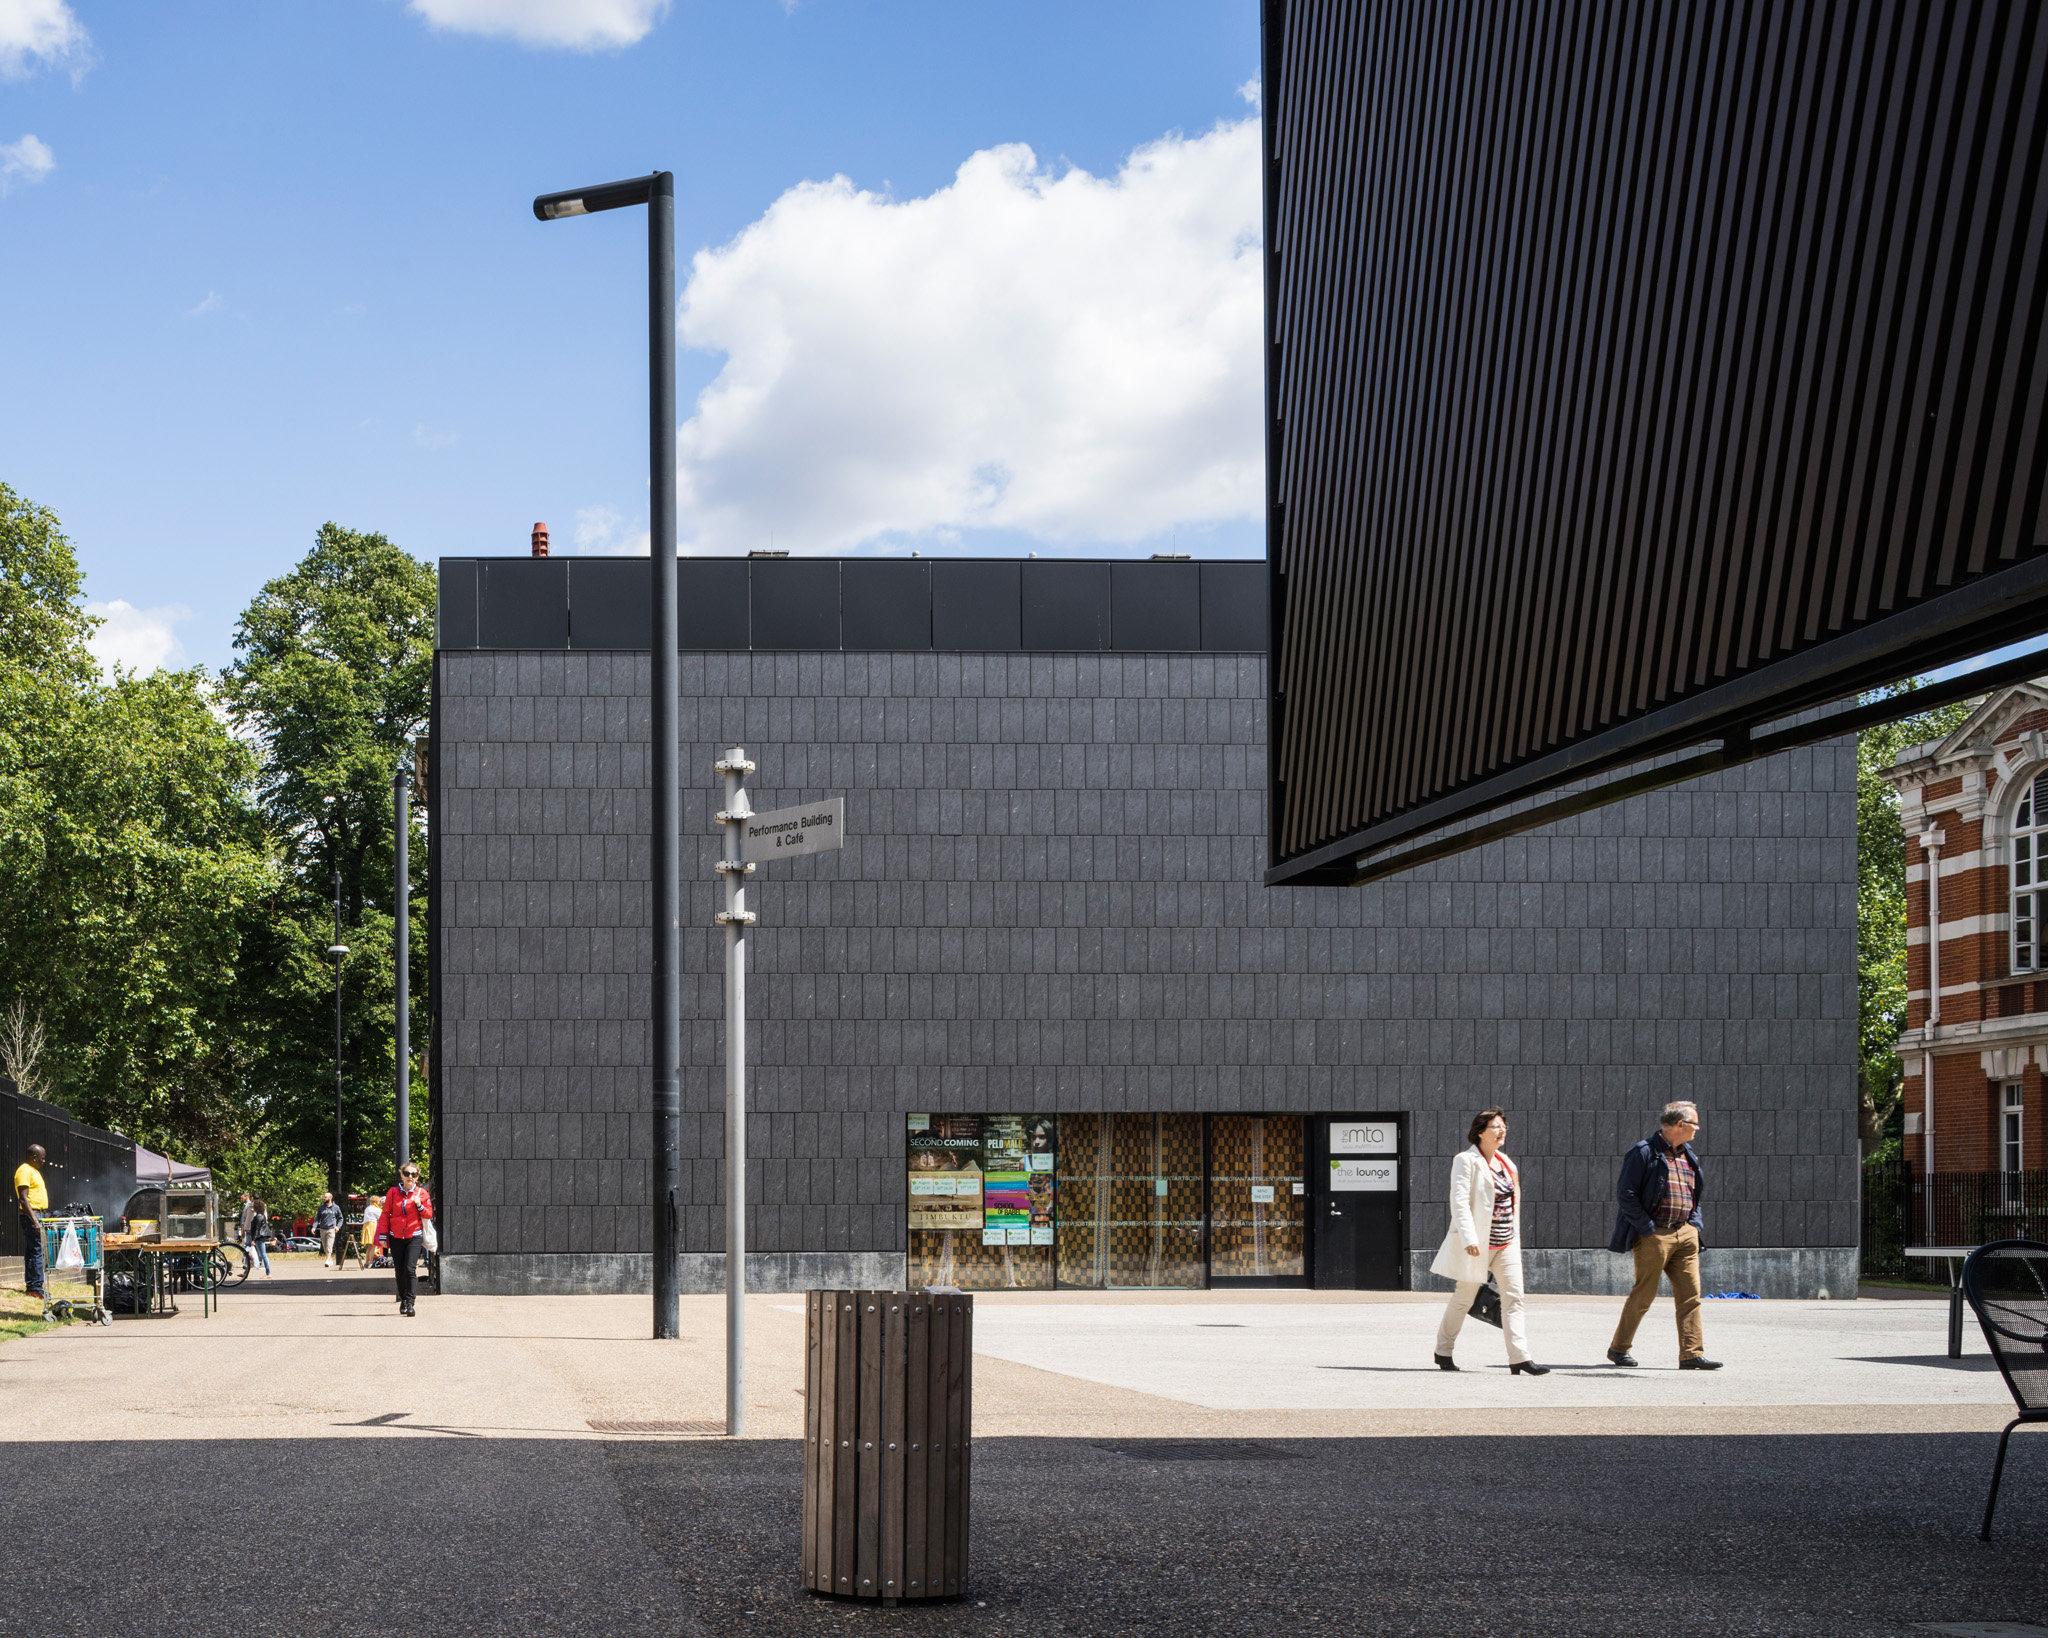 Tottenham Green. Adams and Sutherland and David Adjaye Architects